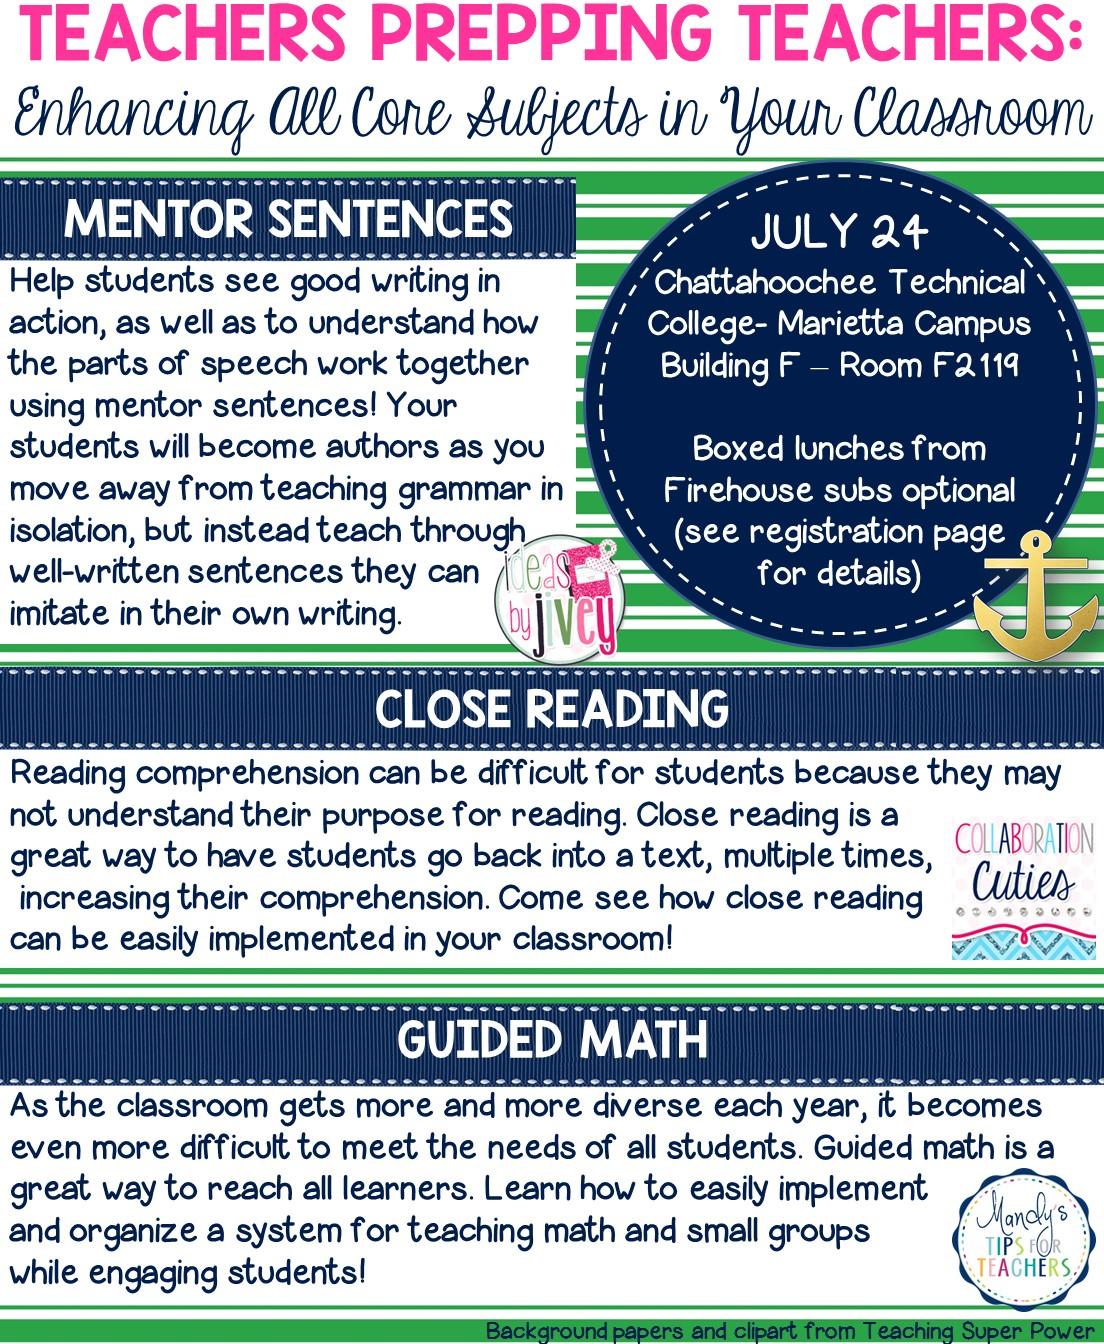 Teachers Prepping Teachers Workshop - Mandy\'s Tips for Teachers